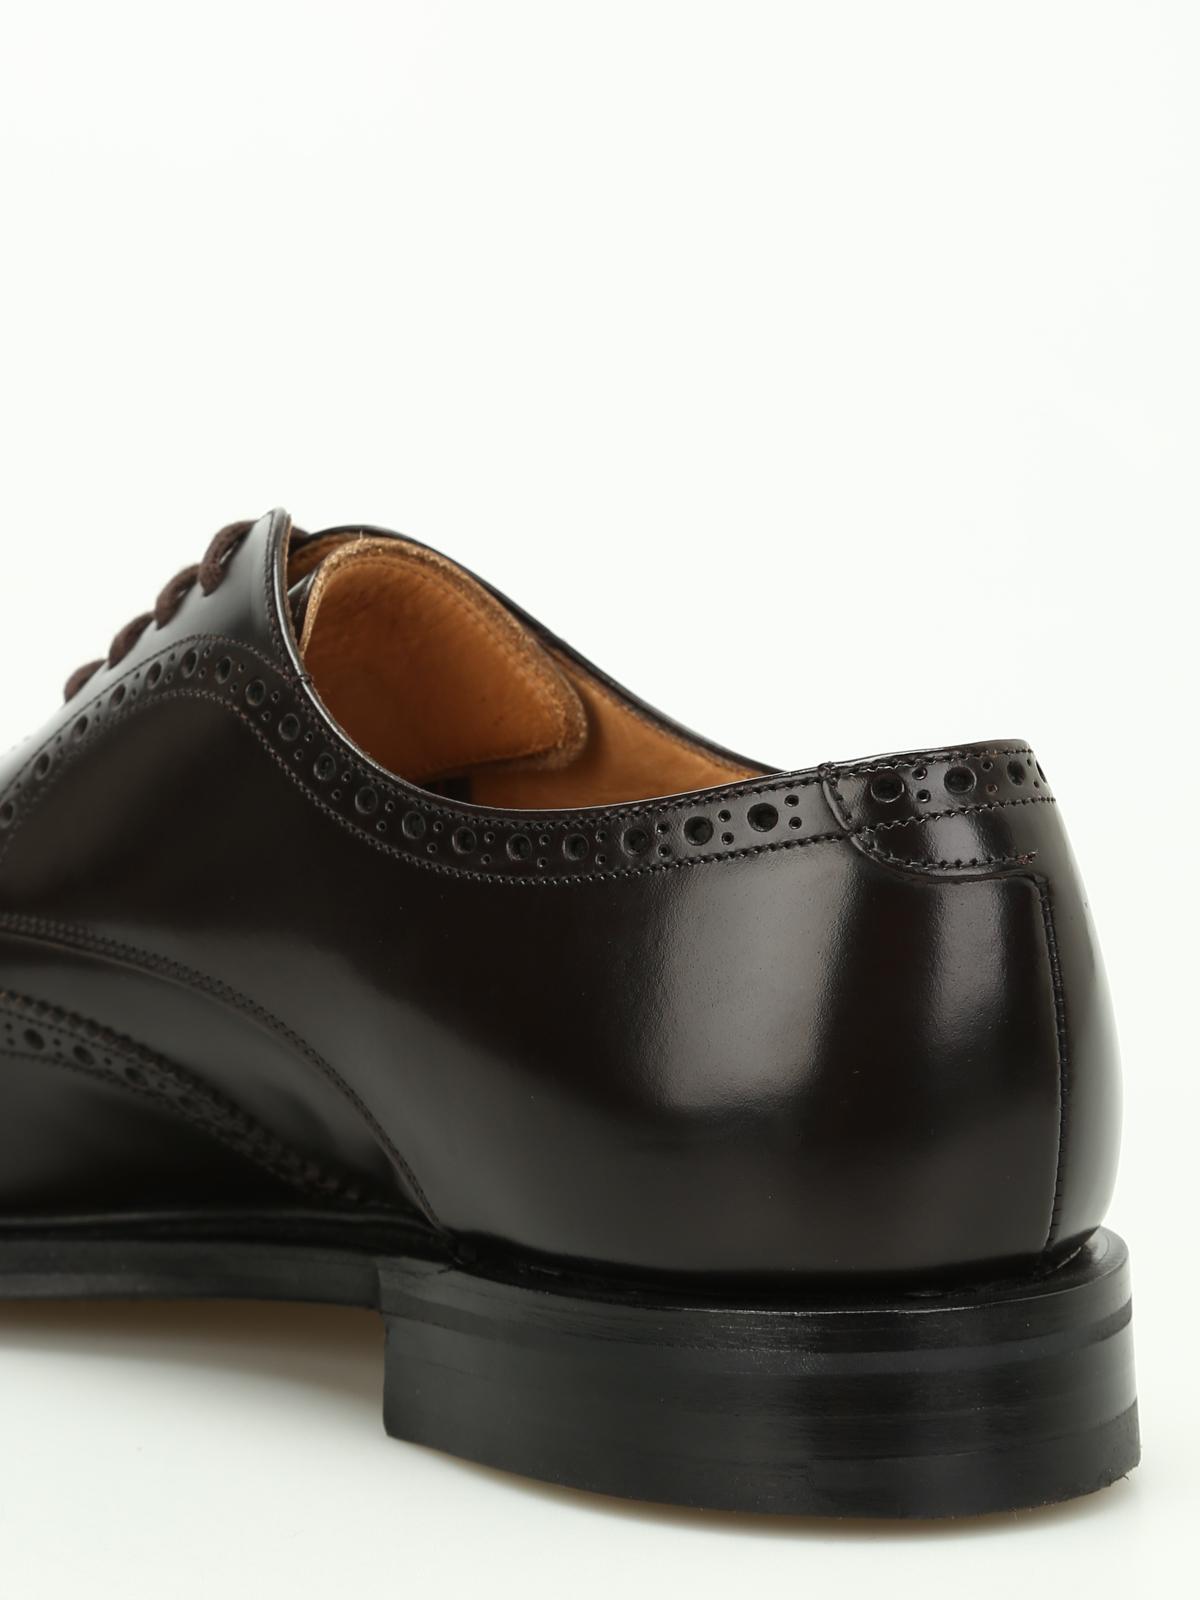 5e0e7fe2b83f Church s - Munich Capital leather shoes - lace-ups shoes - MUNICH R ...